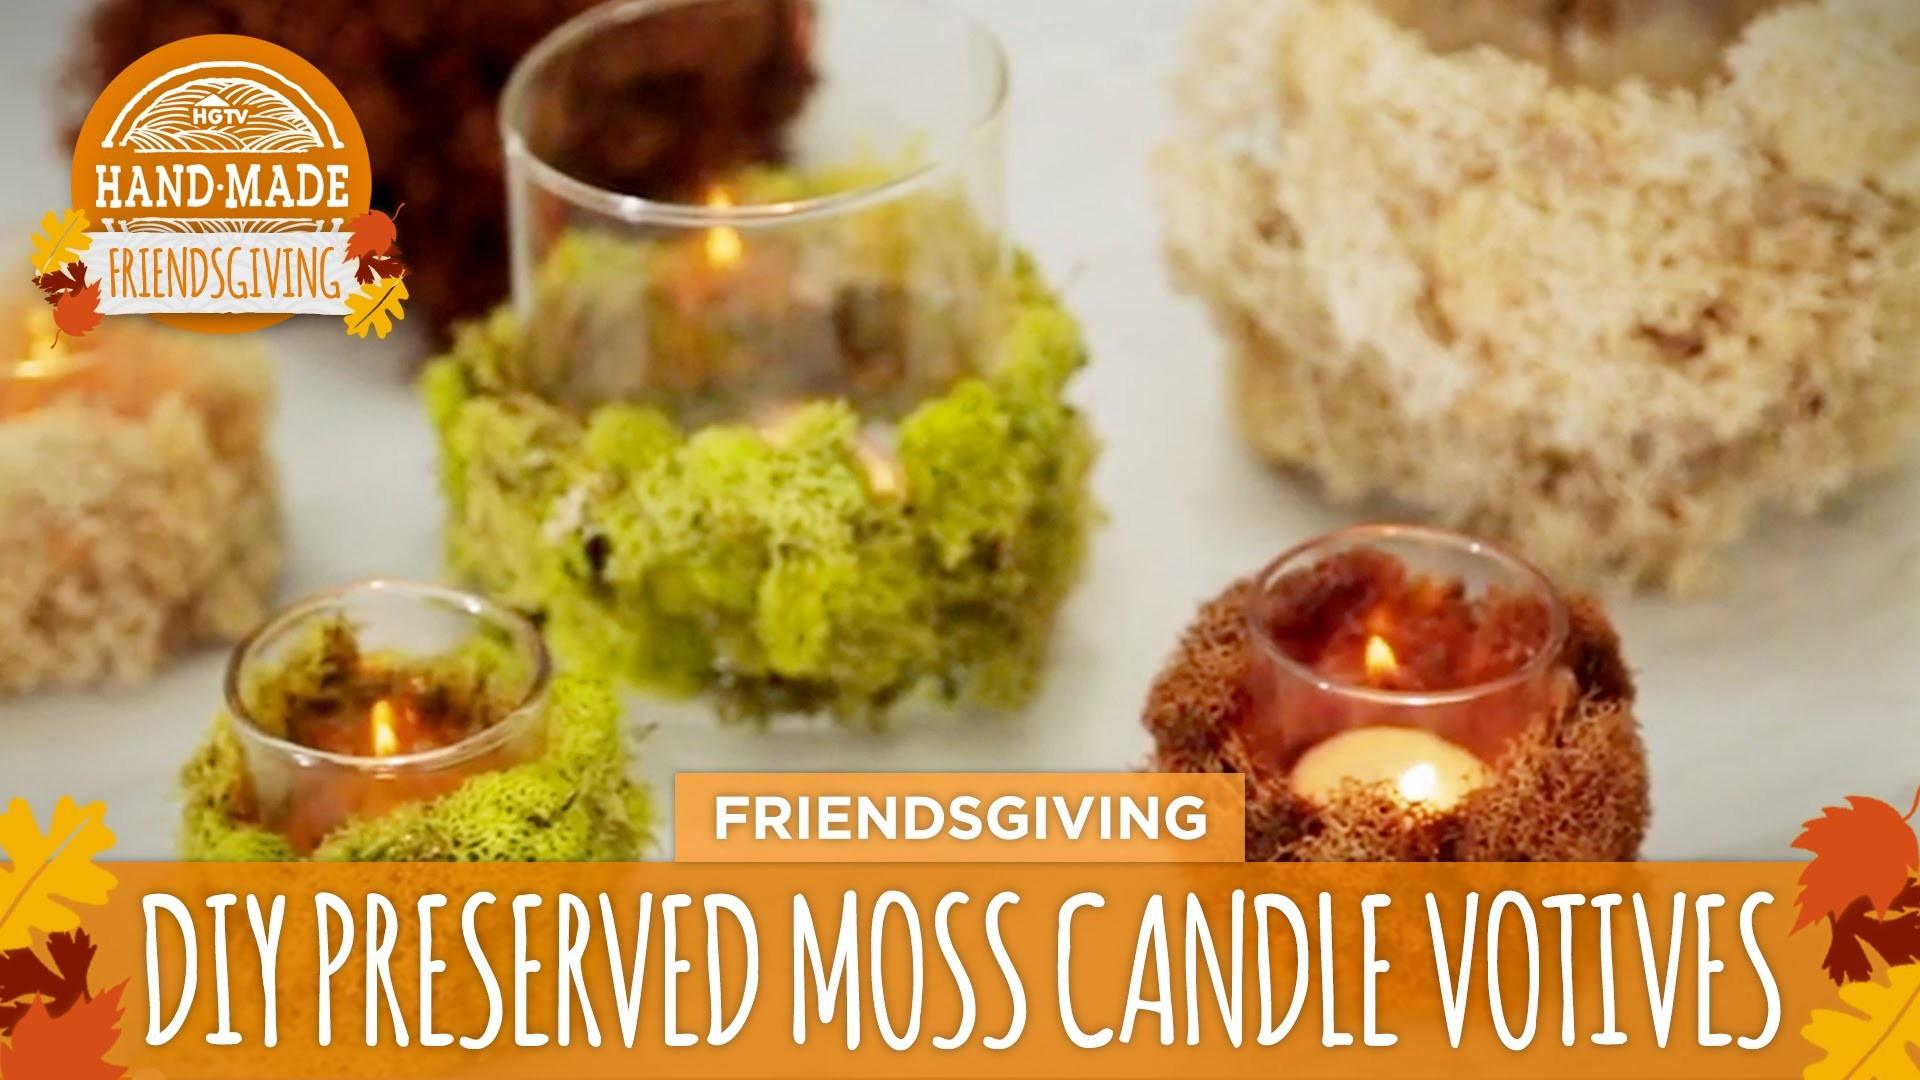 DIY Preserved Moss Candle Votives - HGTV Friendsgiving